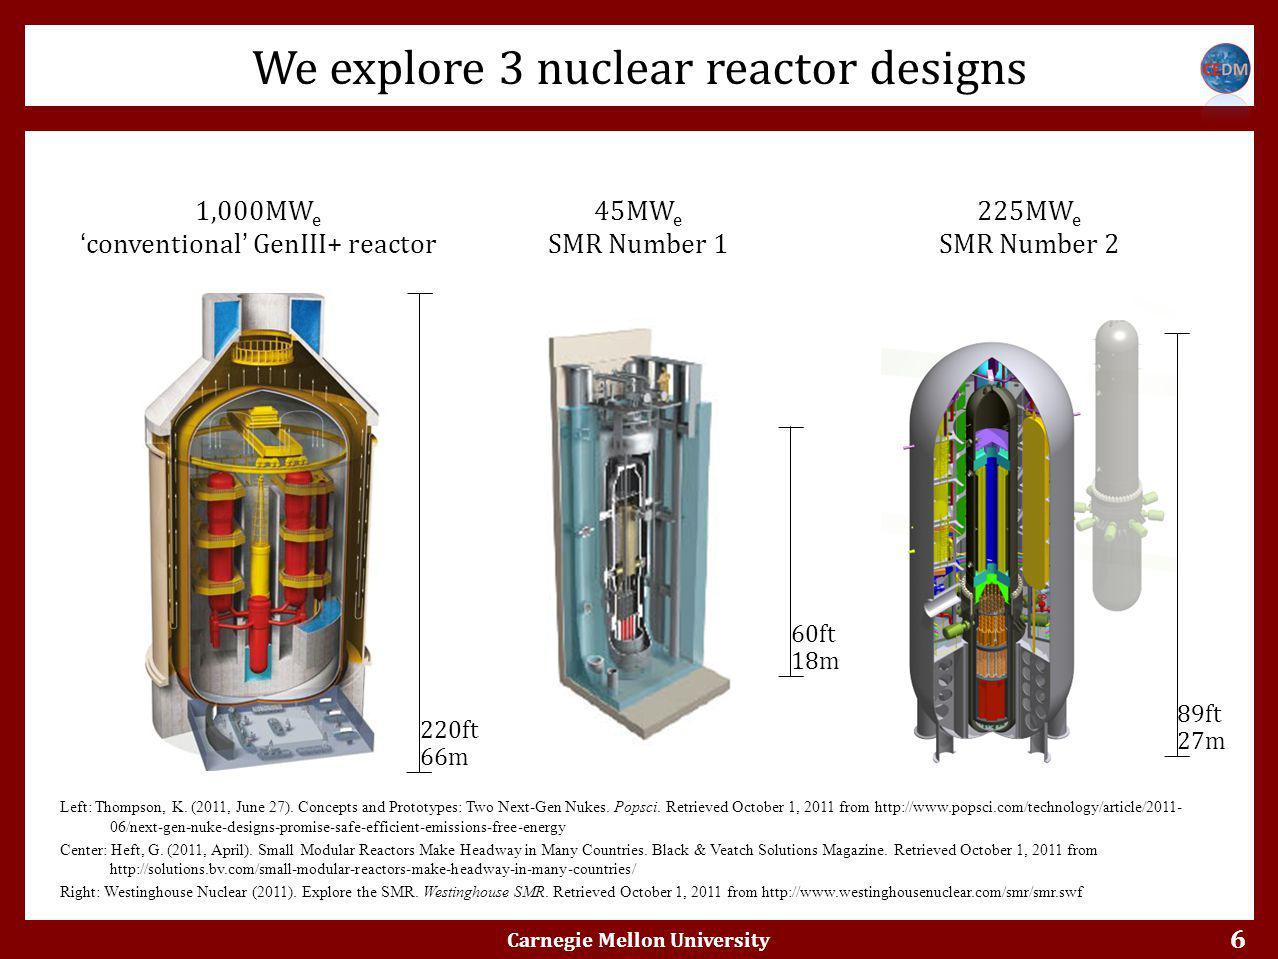 6 We explore 3 nuclear reactor designs Carnegie Mellon University Scenario 1: 1,000MW e 'conventional' GenIII+ reactor Scenario 2: 45MW e SMR Number 1 Scenario 5: 225MW e SMR Number 2 Left: Thompson, K.